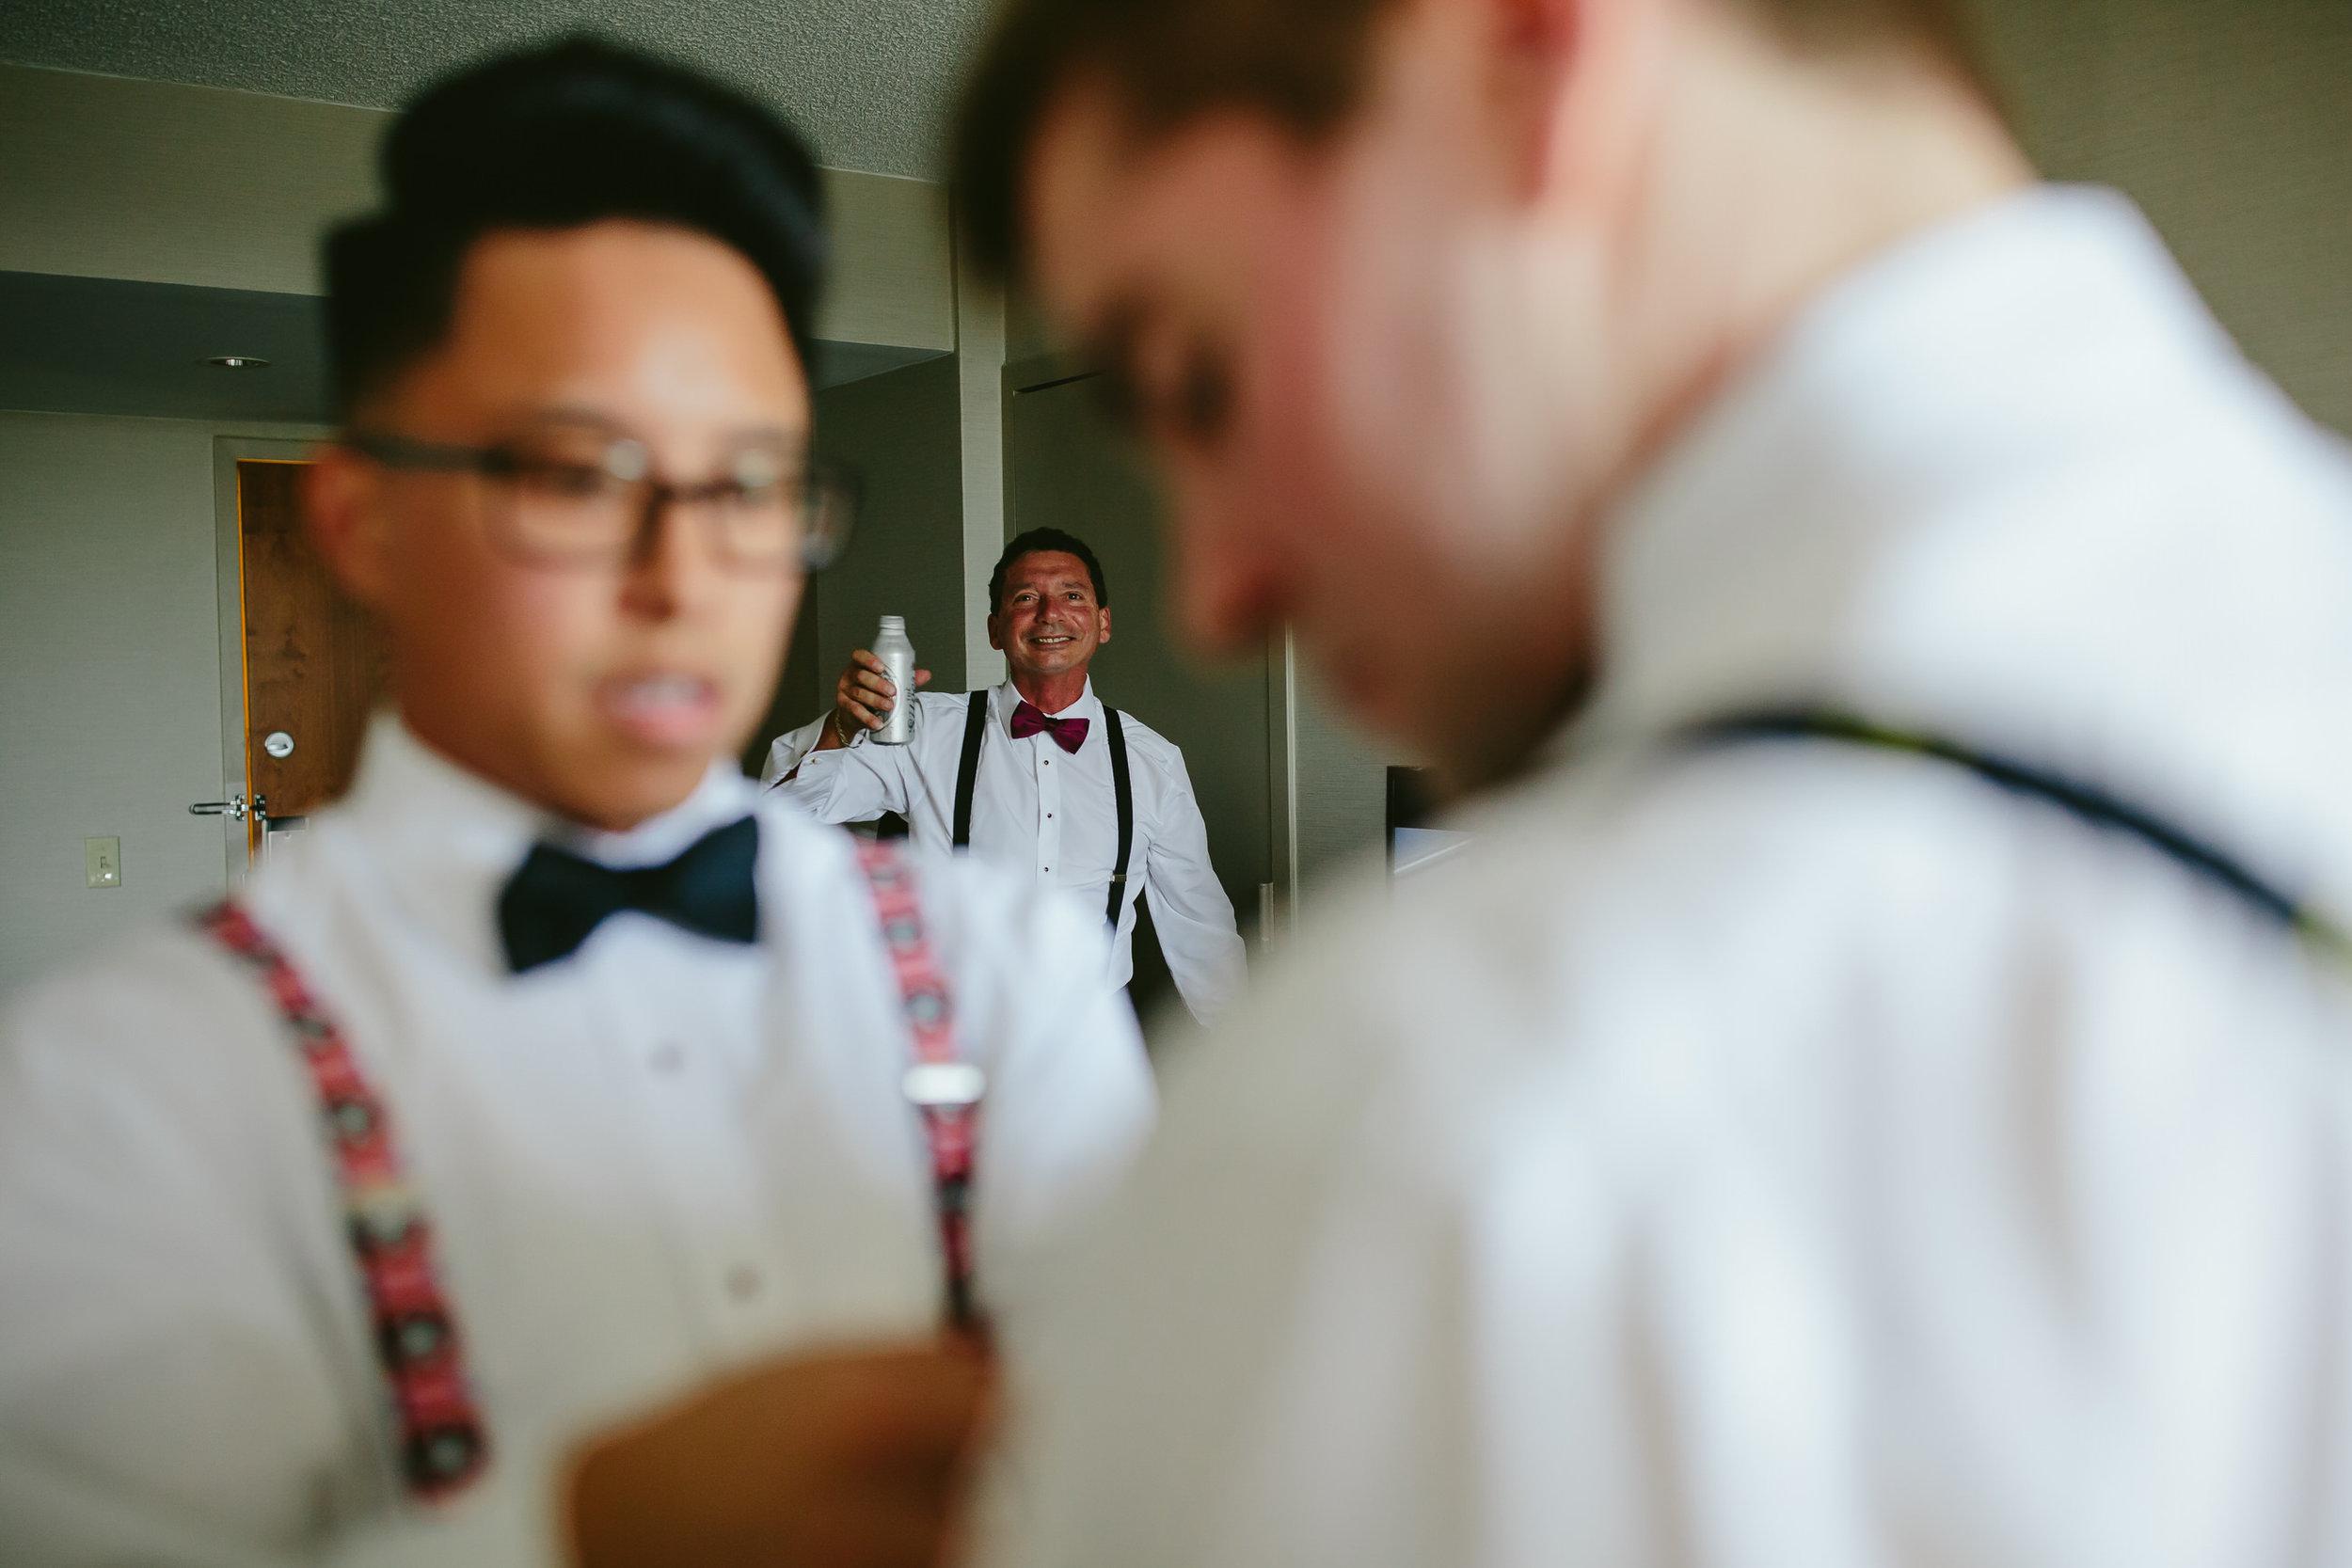 groom-getting-ready-florida-wedding-photographer-father-moment-tiny-house-photo.jpg